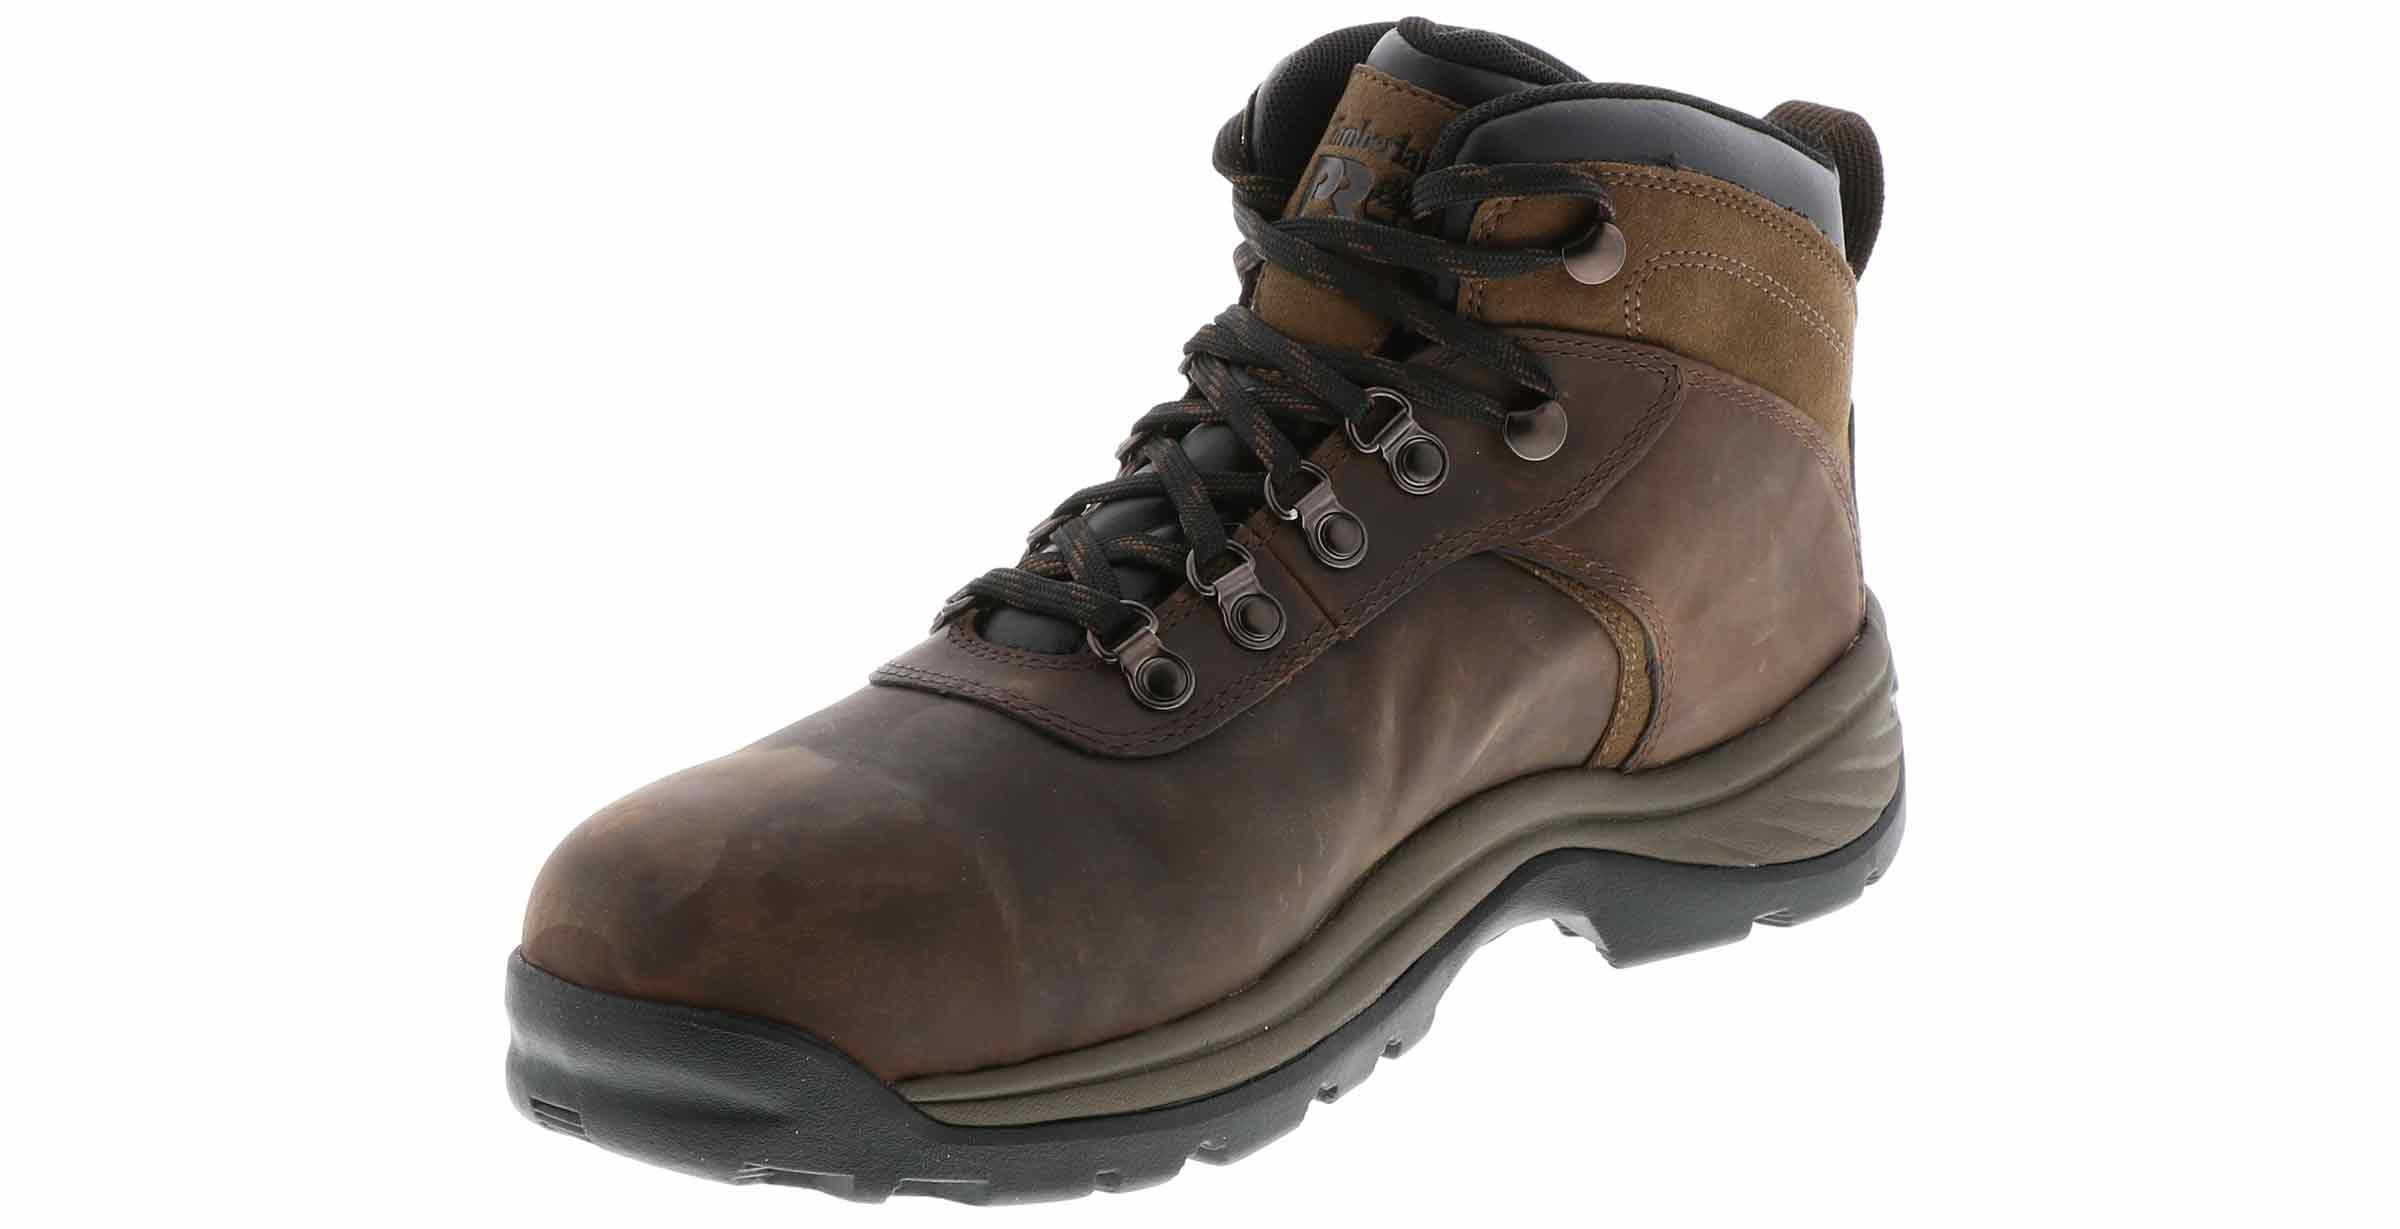 48929cb9b60 Men's Timberland Pro Flume Mid Steel Toe